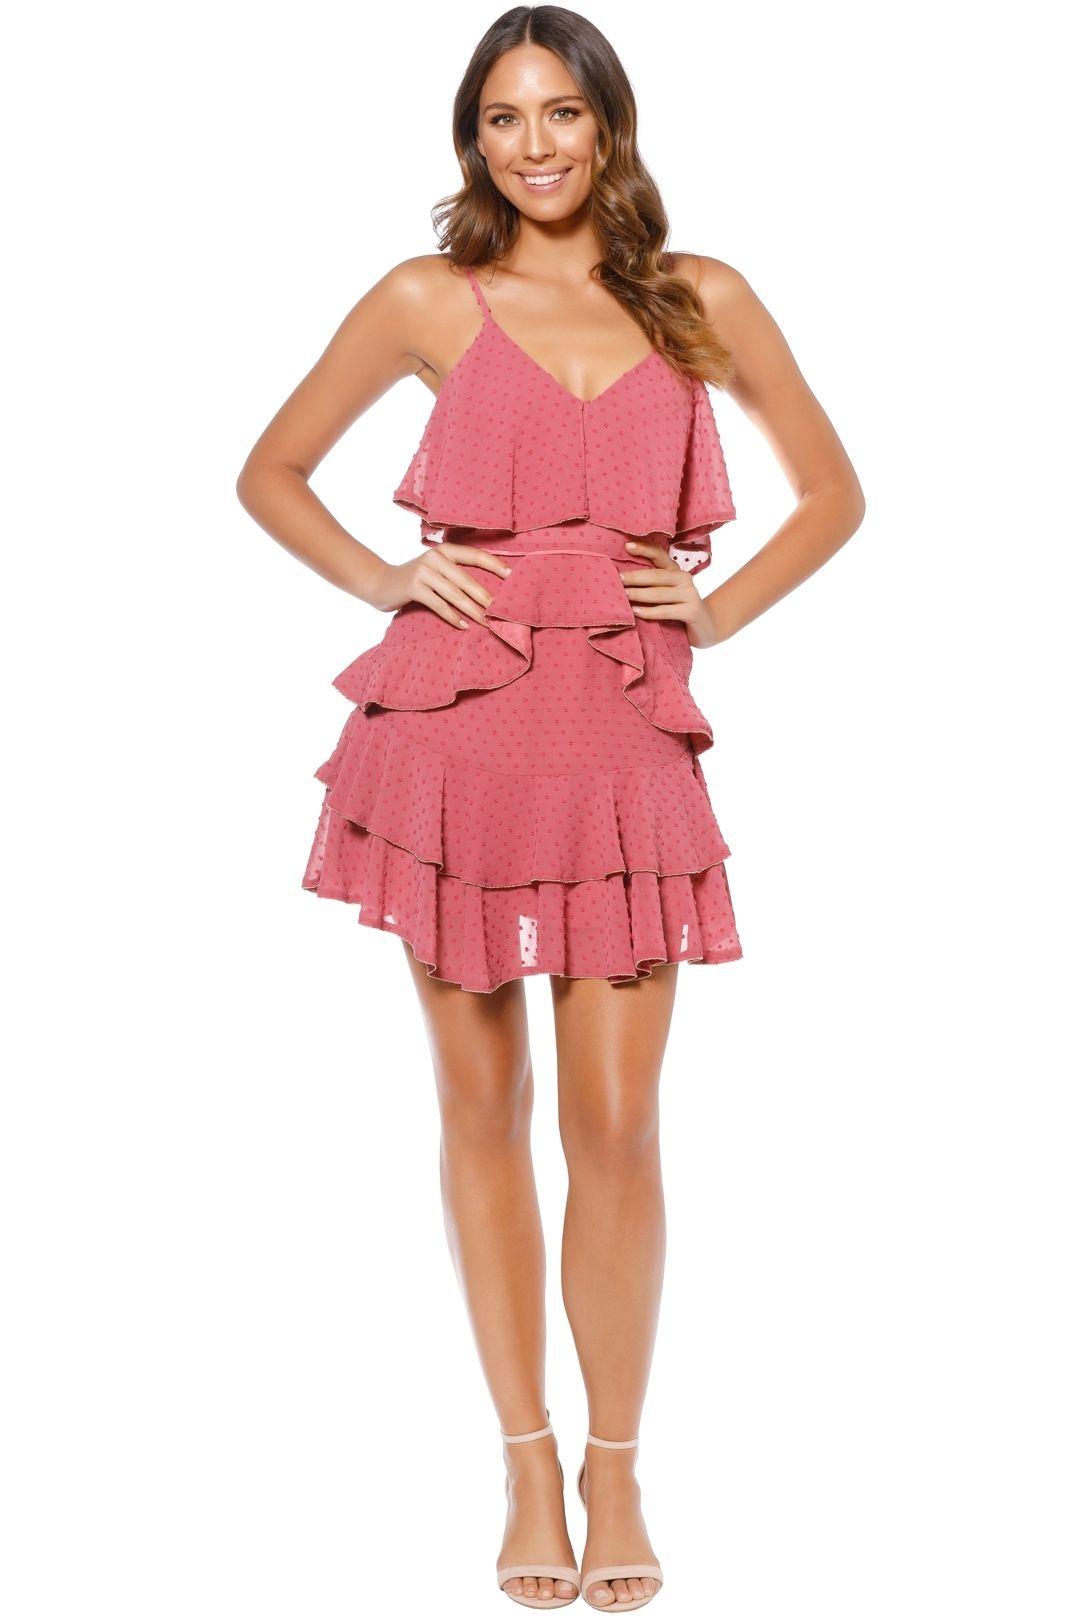 Talulah - Soft Posey Mini Dress - Pink - Front